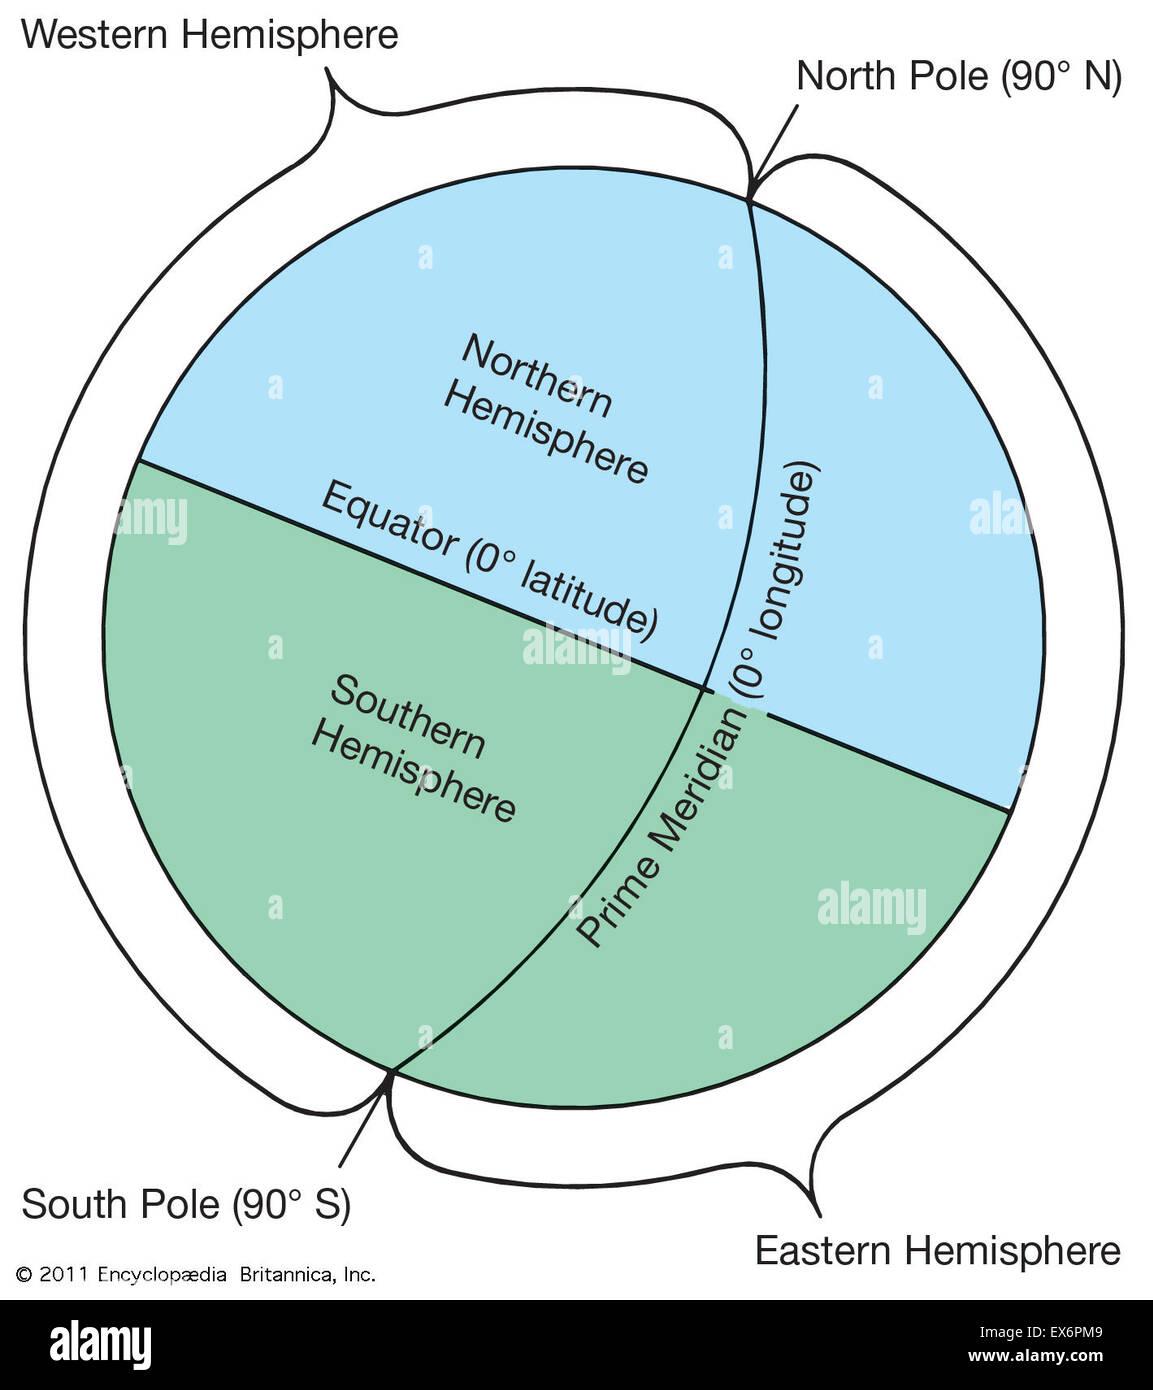 Hemisphere - Stock Image